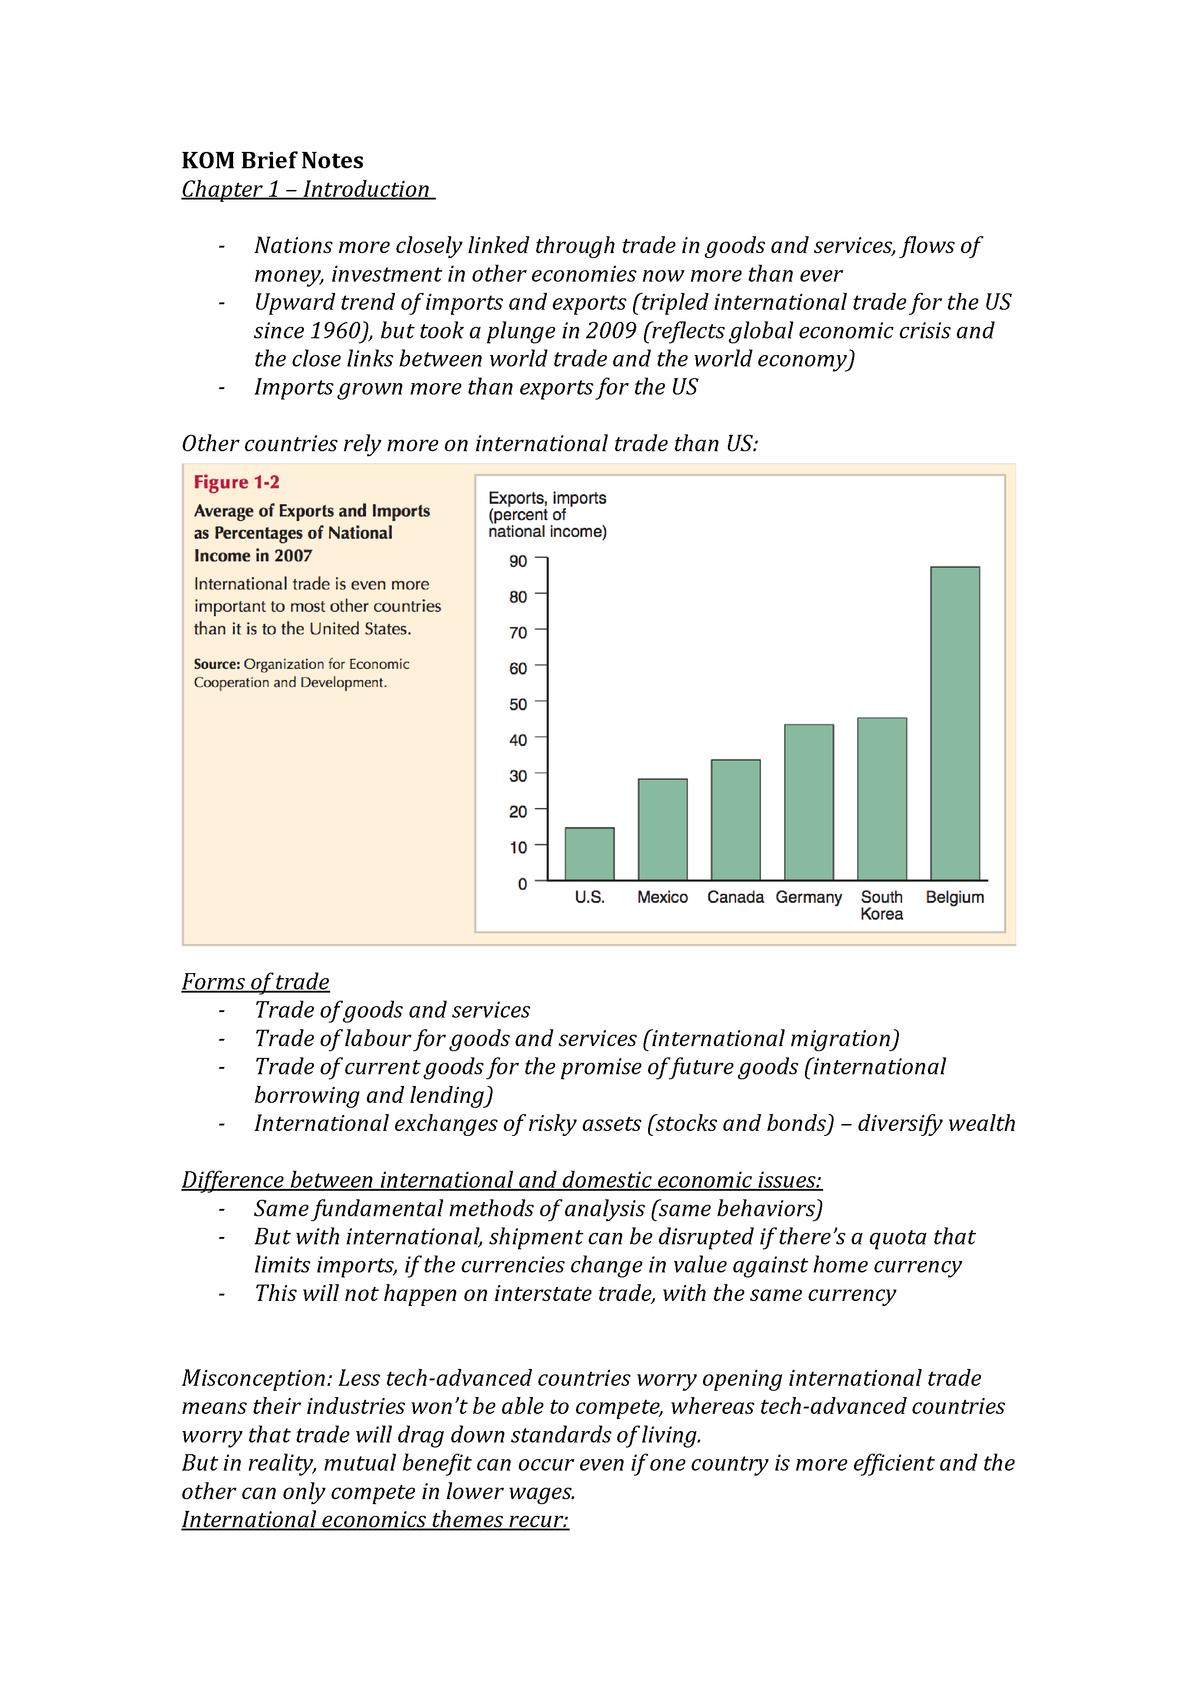 International Economics' book summary notes - ECON3004 - StuDocu